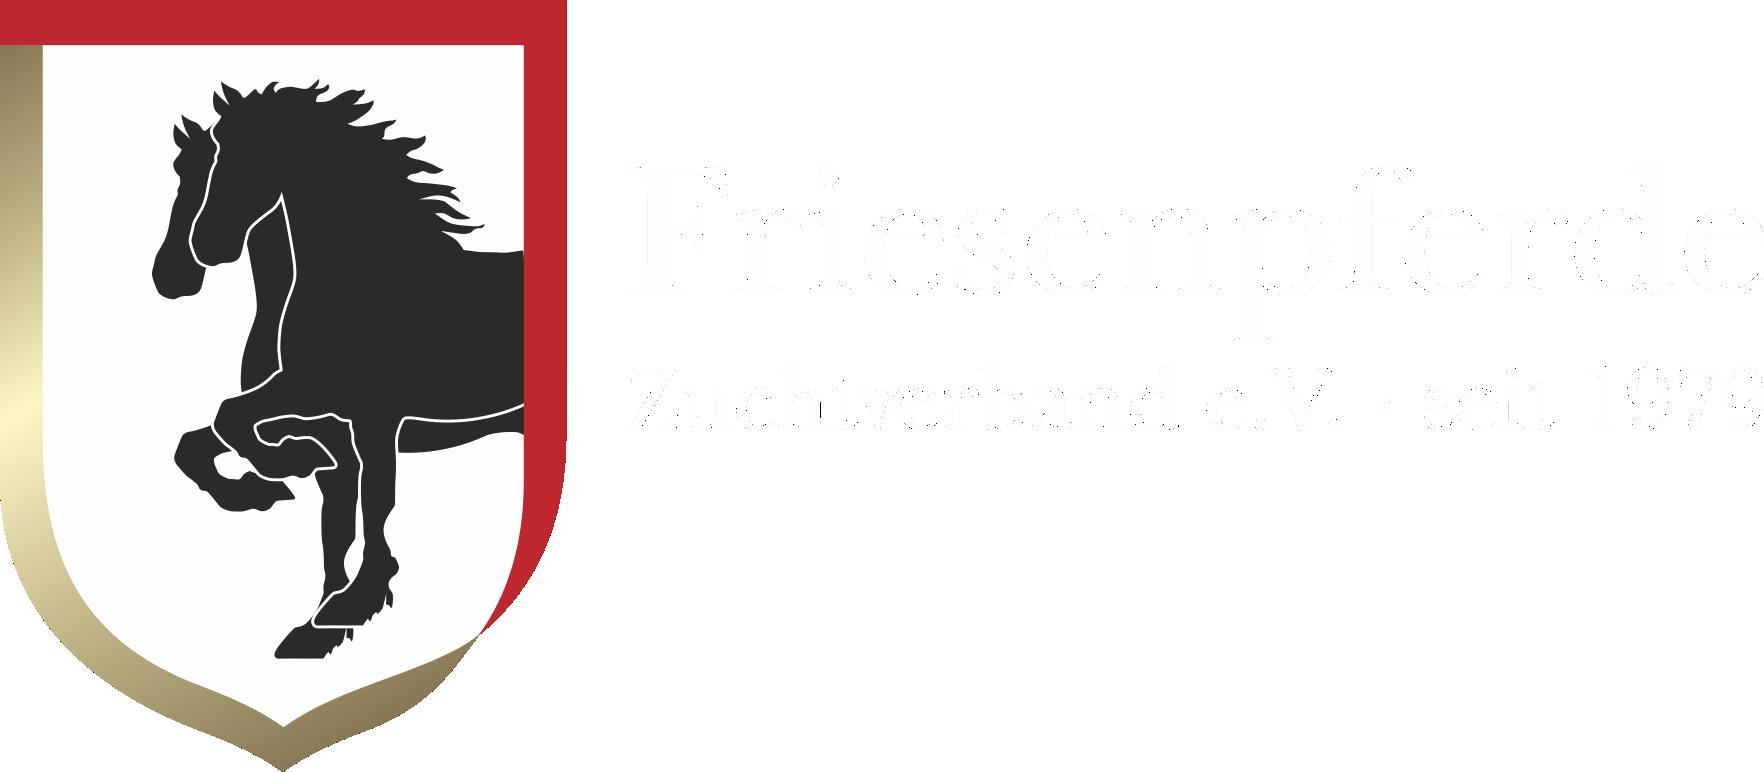 FRIESENPFERDE Zuchtverband e. V.